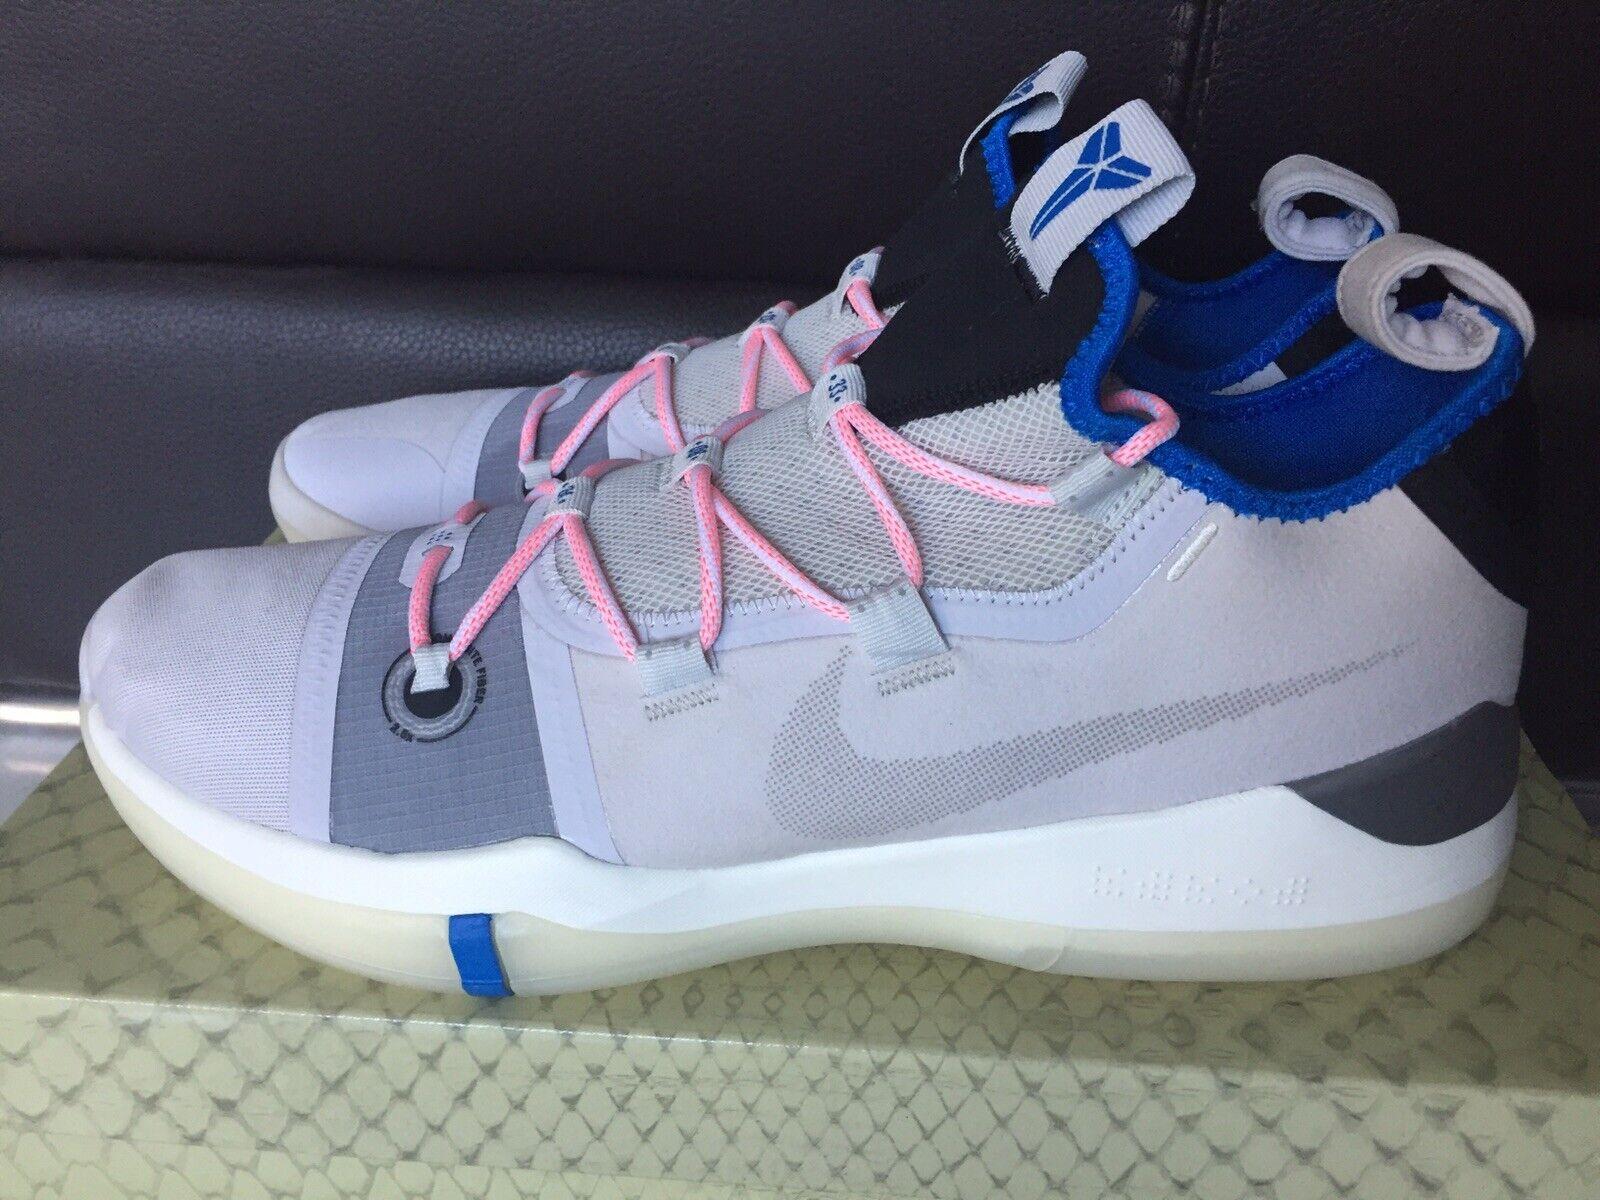 Nike Kobe AD Basketball Shoes Mens Size